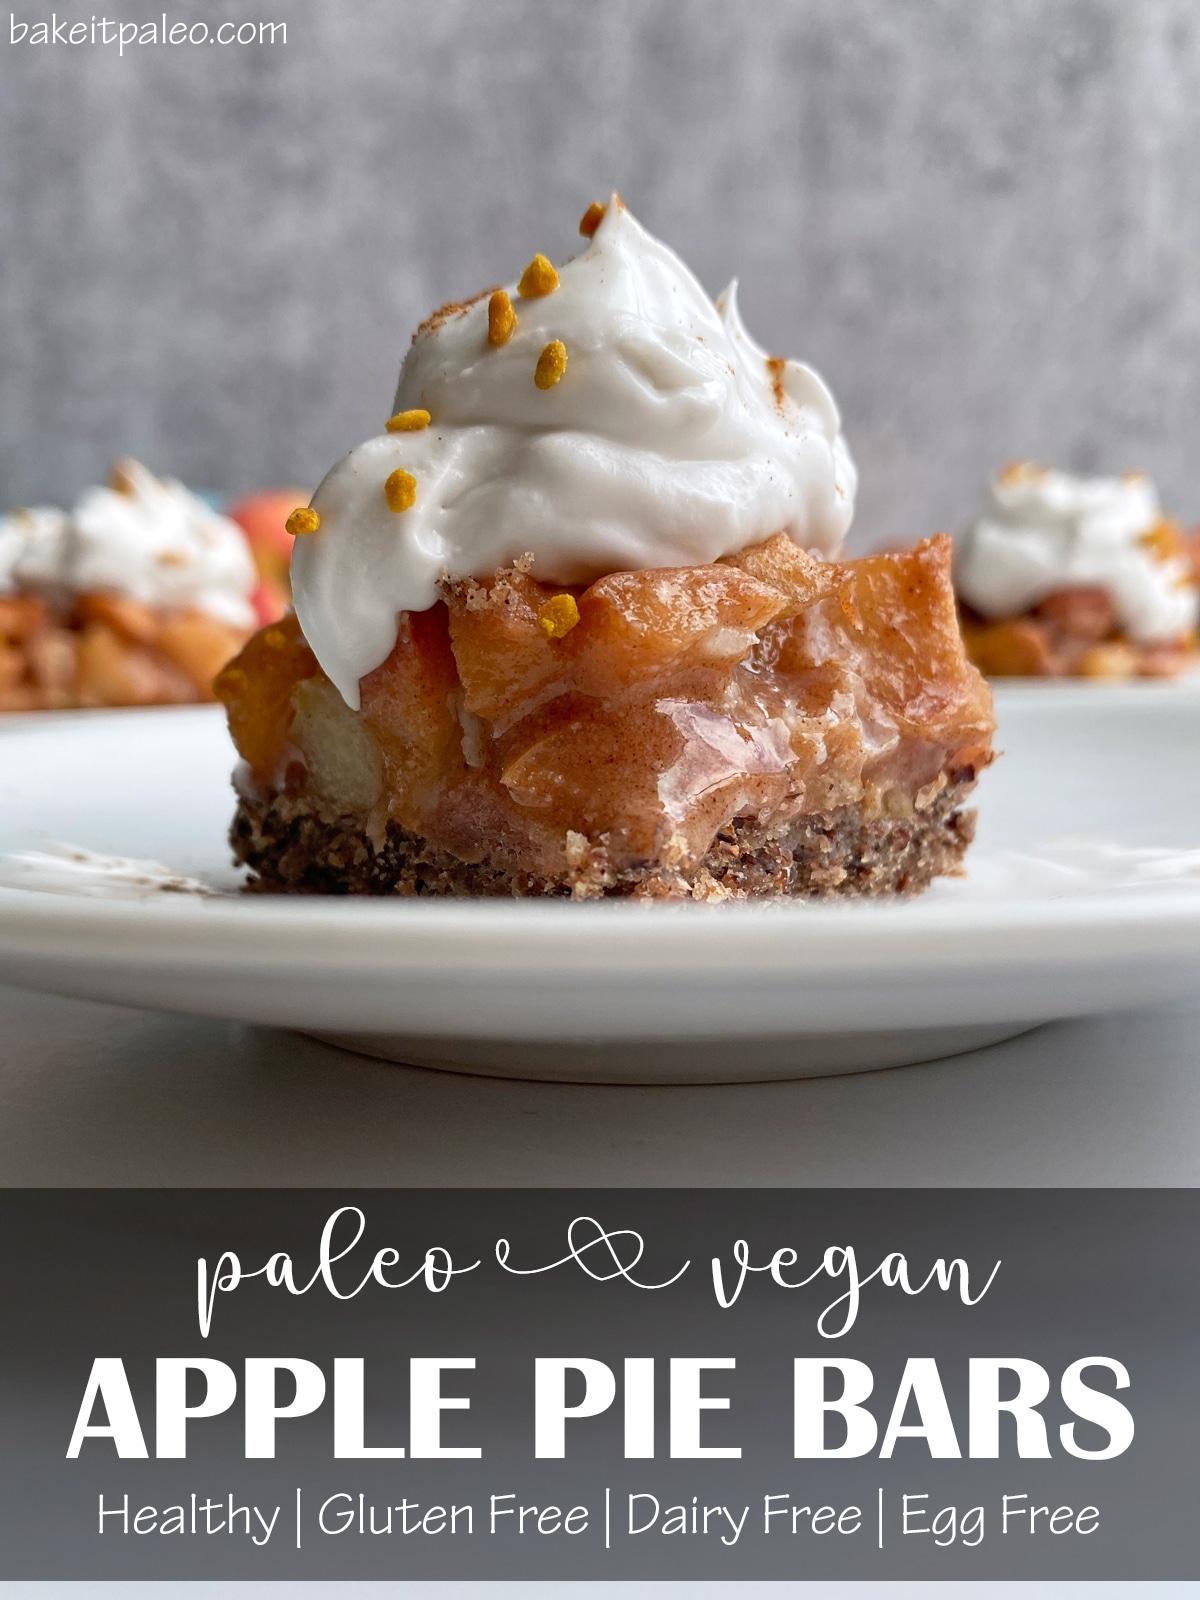 Paleo-and-Vegan-Apple-Pie-Bars